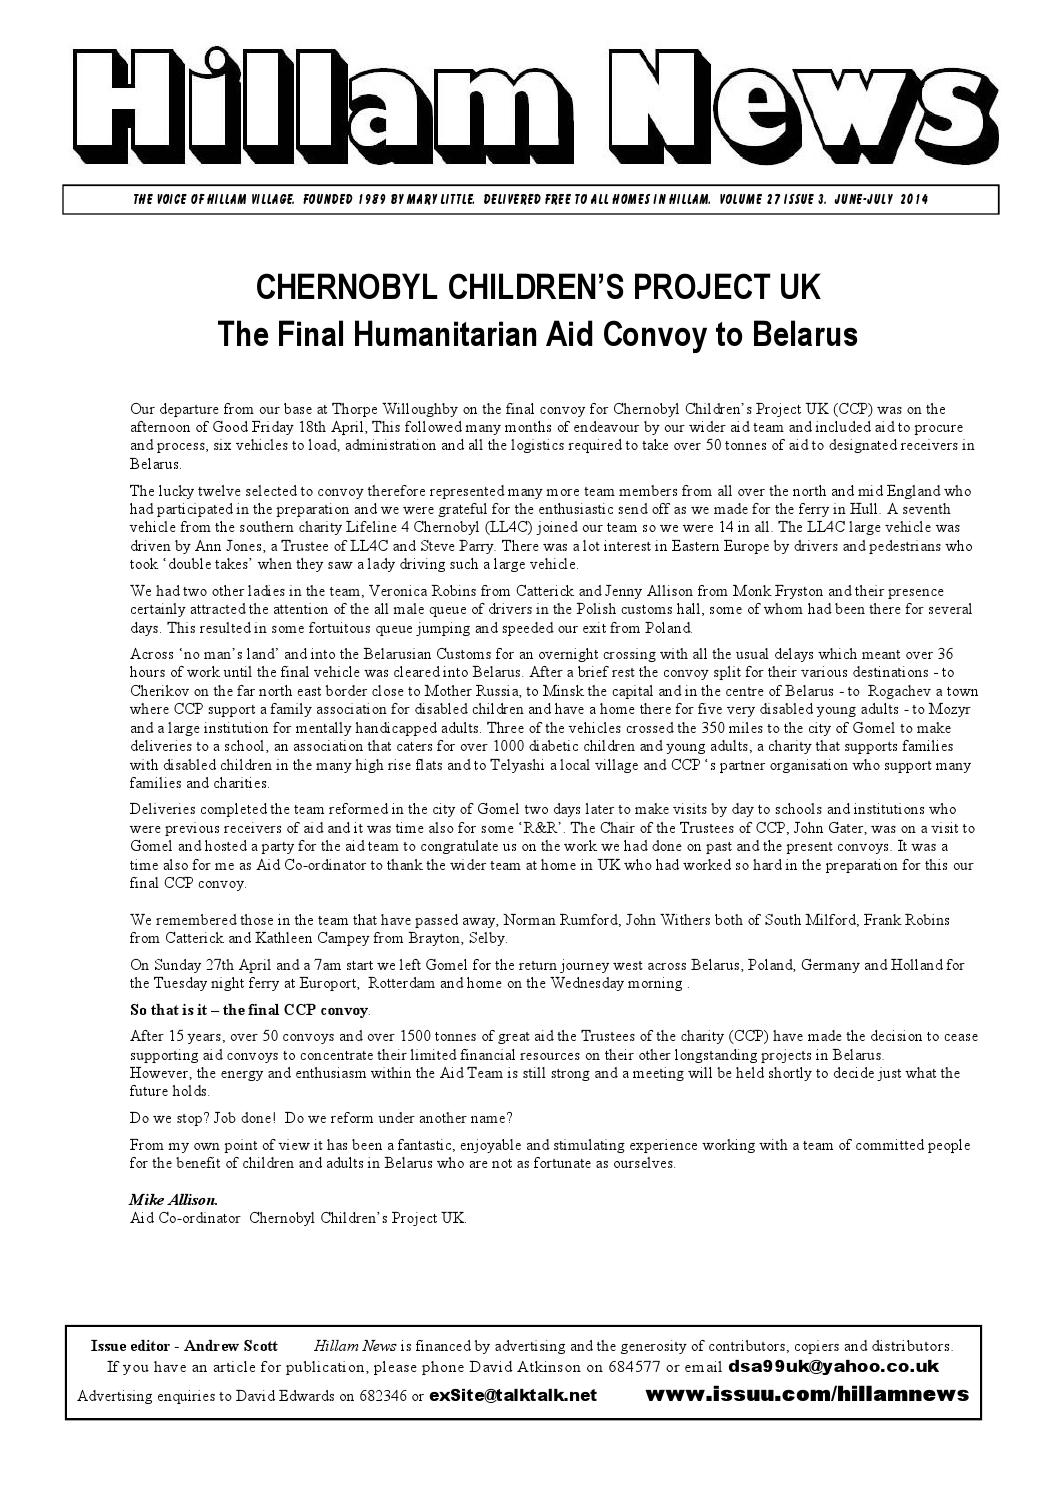 c09a333e6e Hillam news june july 2014 by Hillam News - issuu